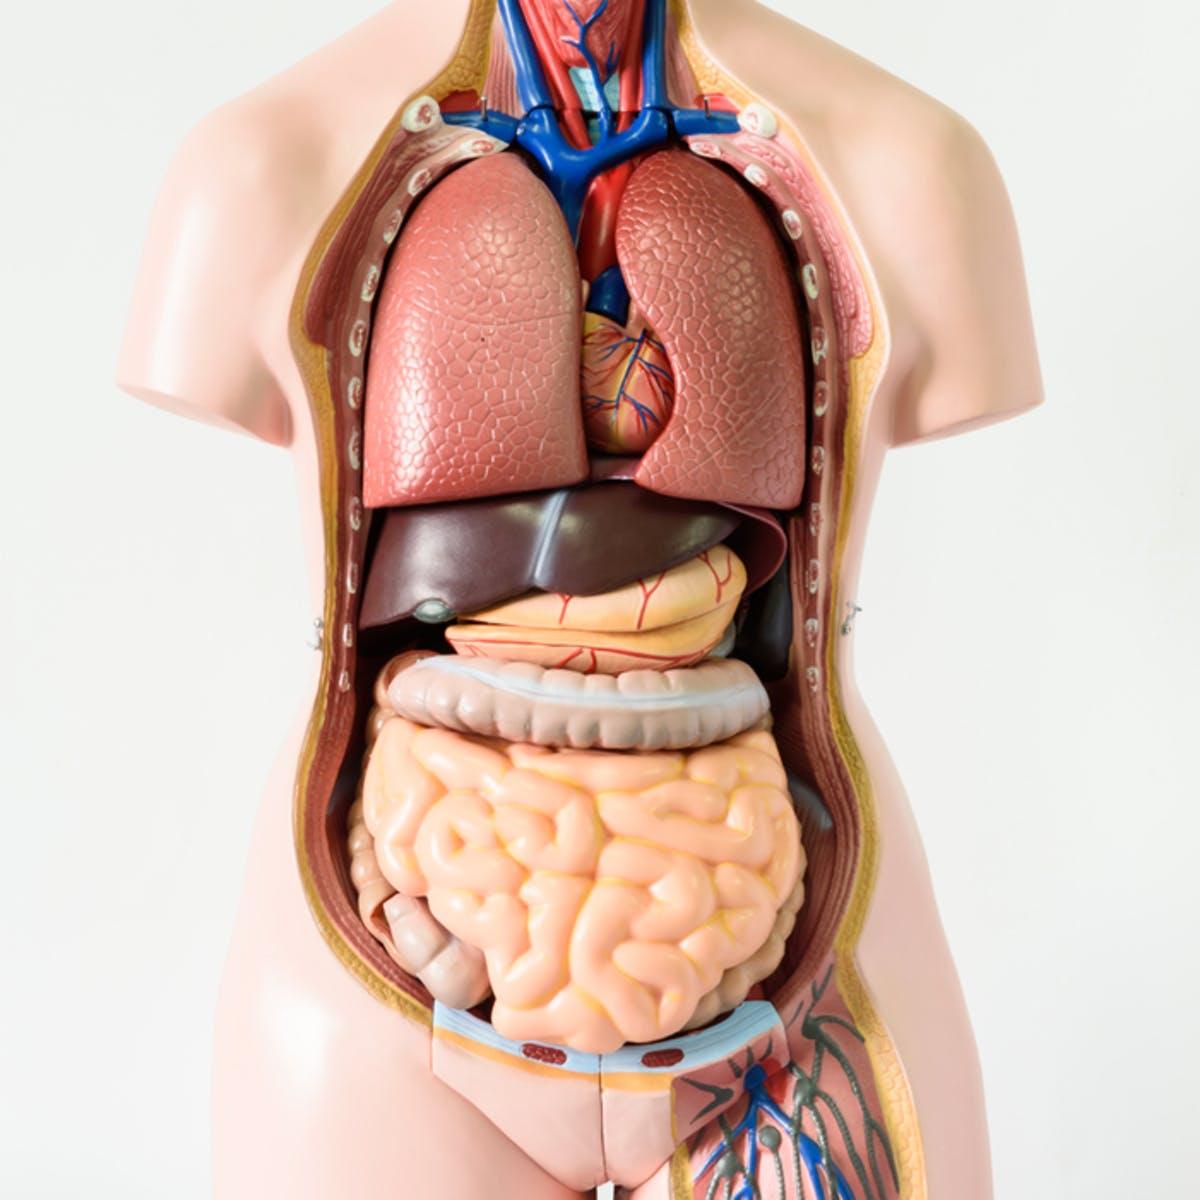 human vital organs